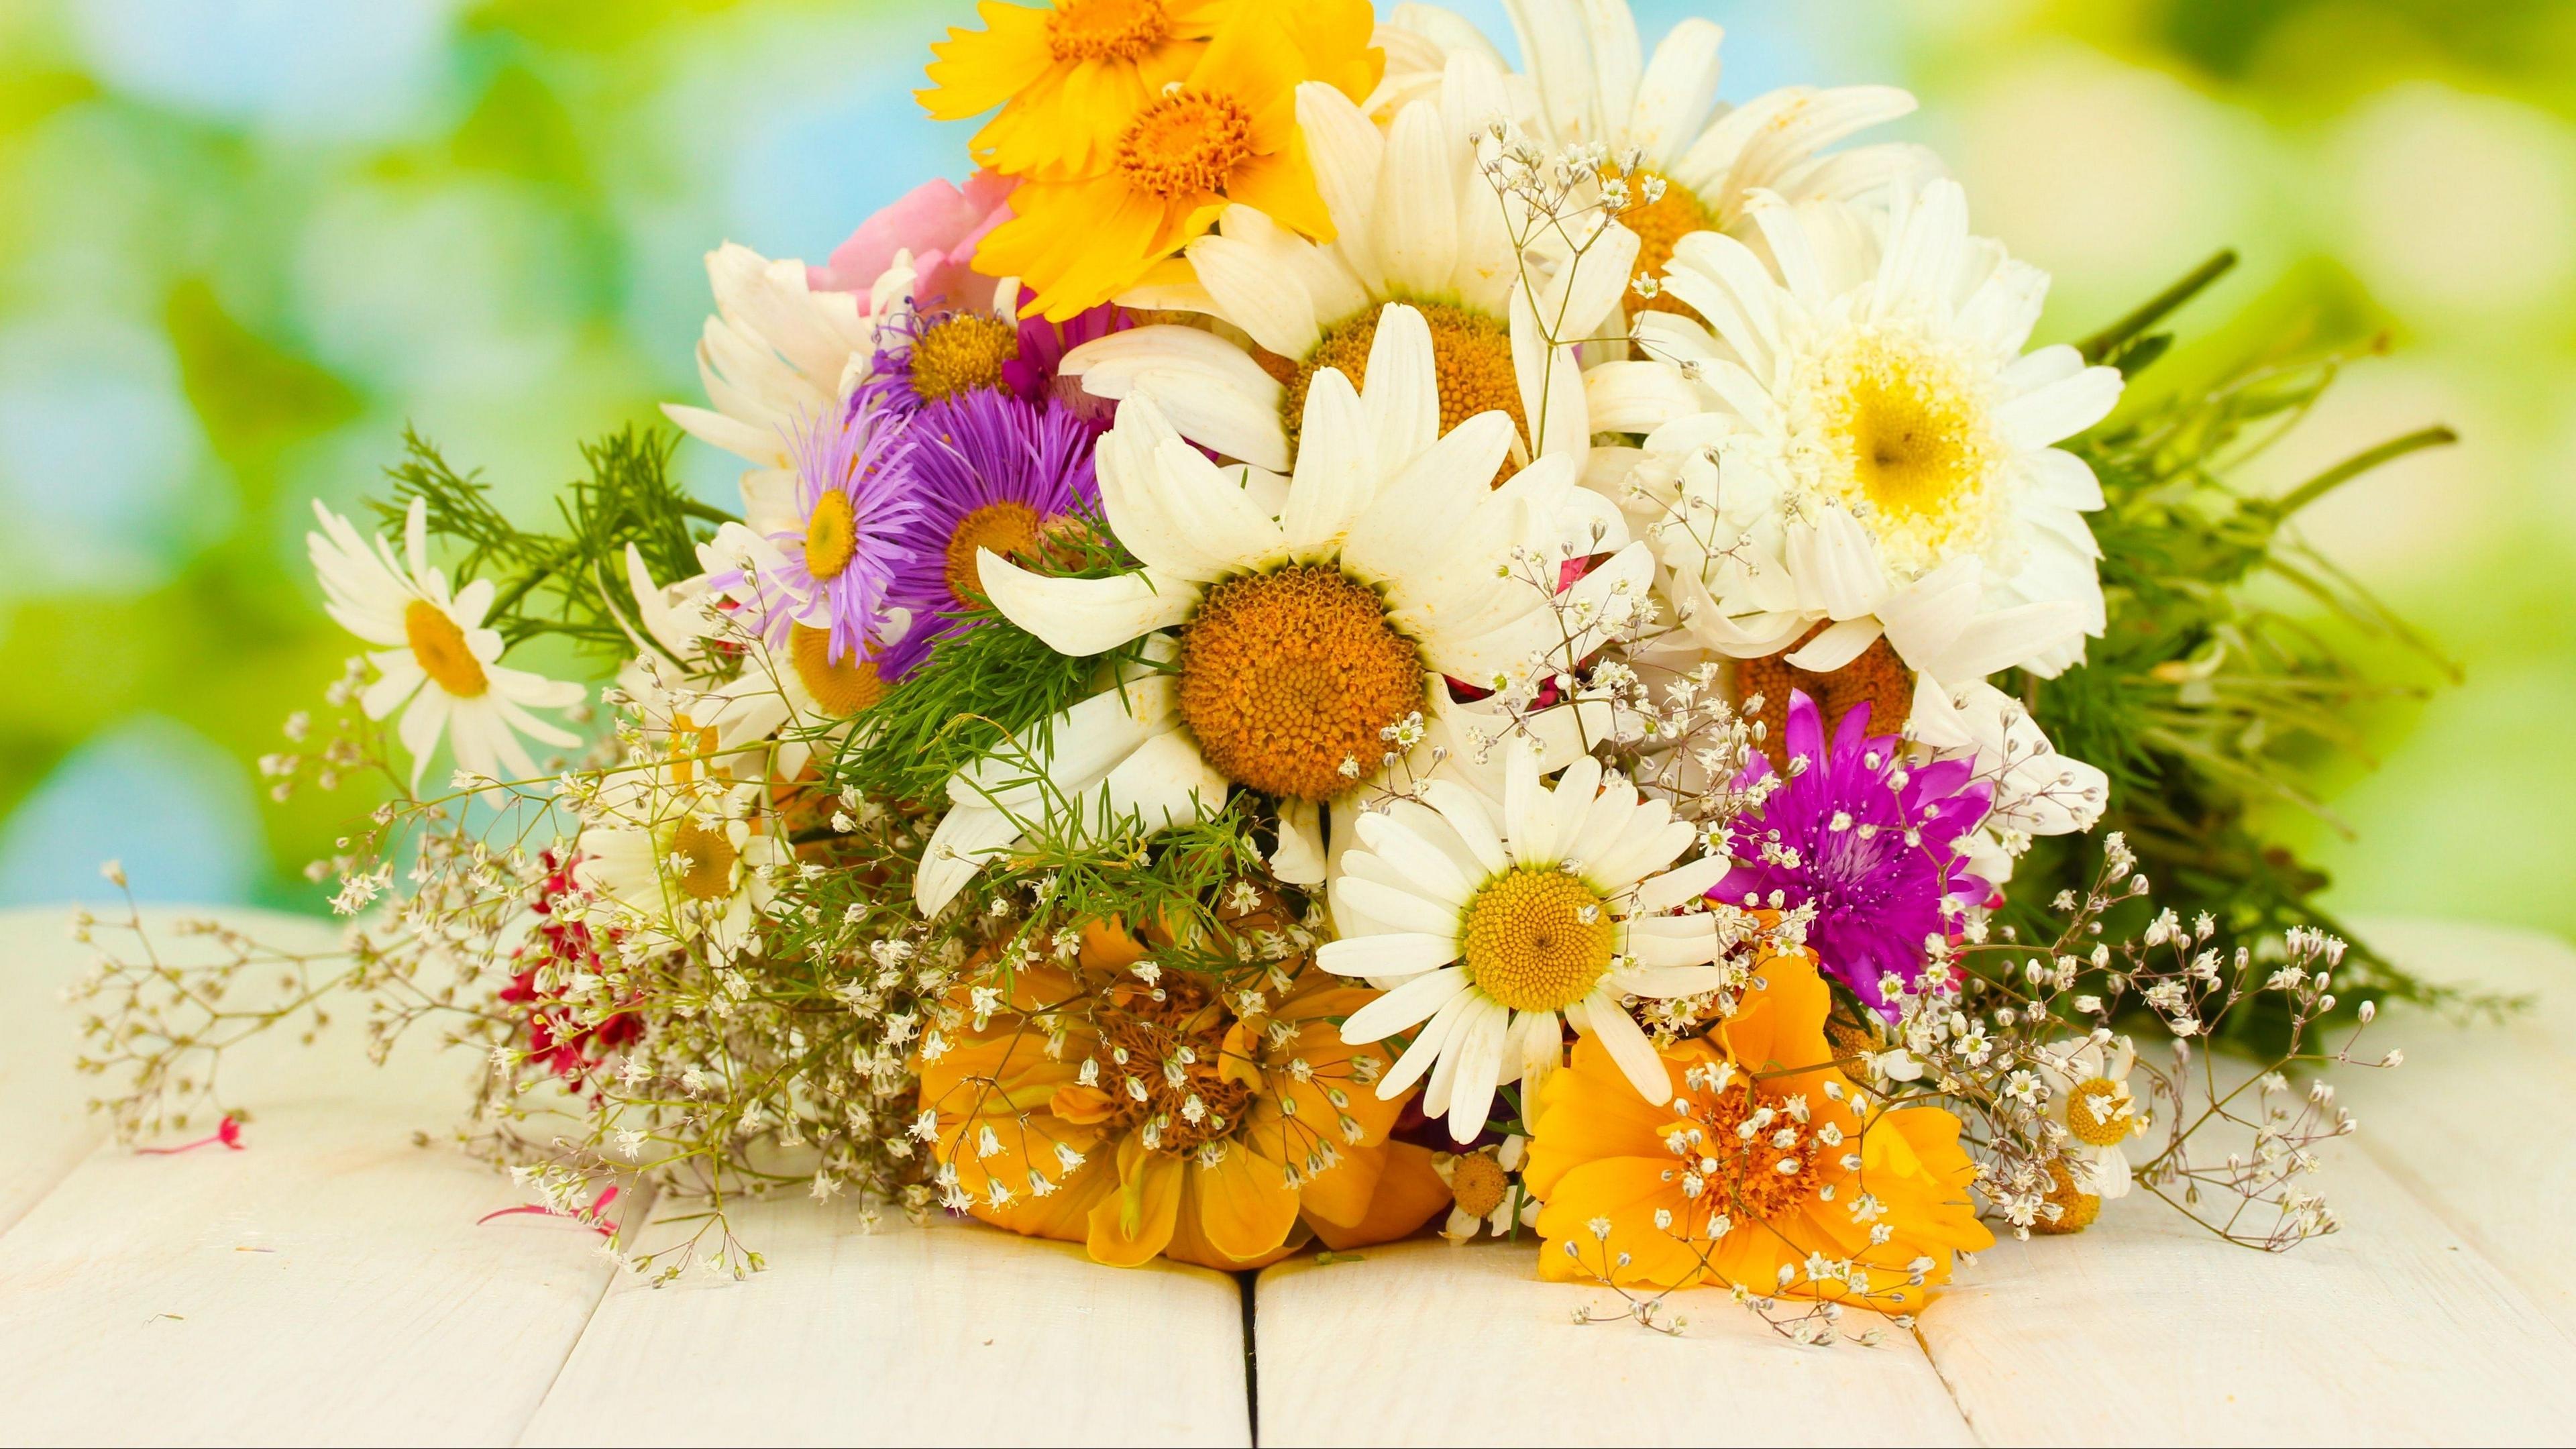 daisies asters gypsophila flower beauty 4k 1540064312 - daisies, asters, gypsophila, flower, beauty 4k - gypsophila, Daisies, asters